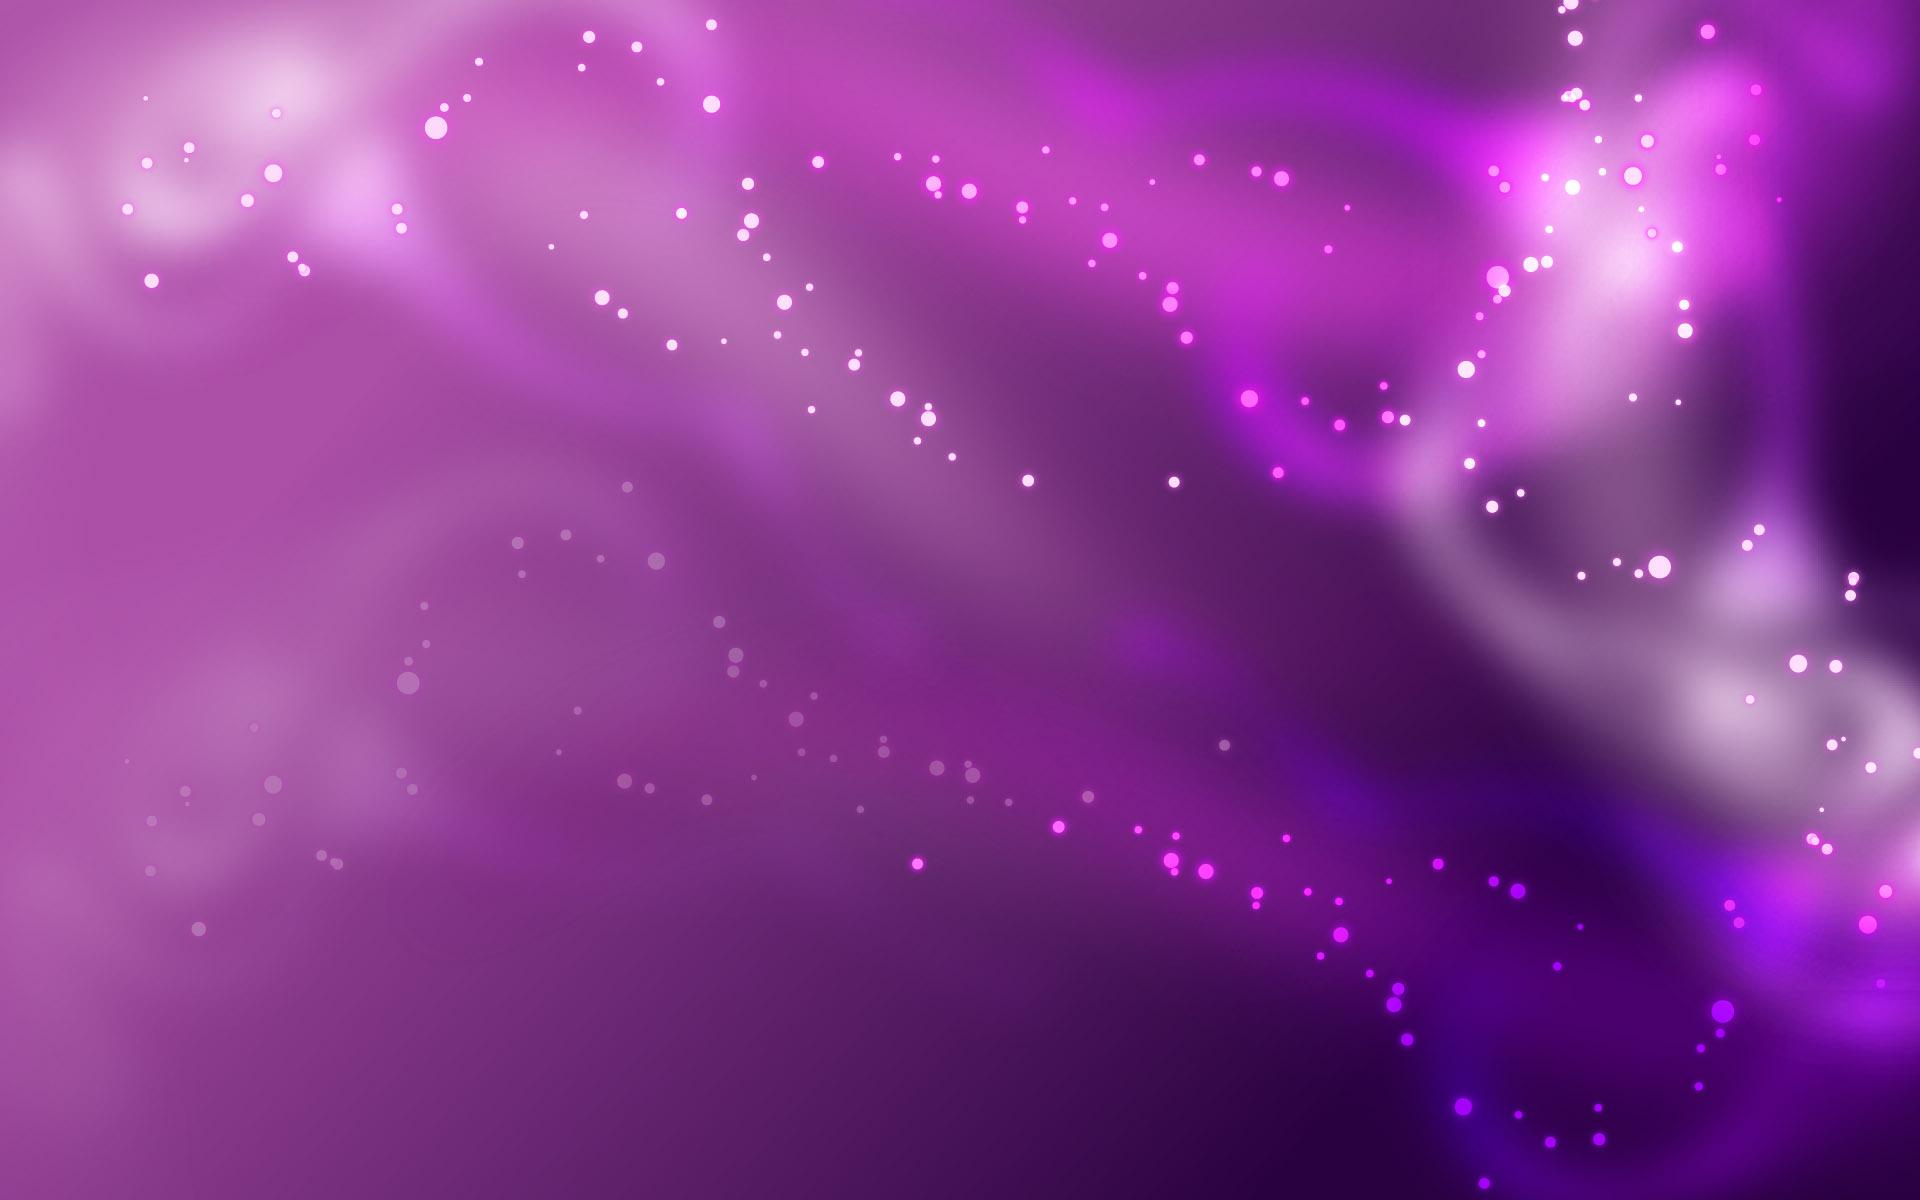 Purple wallpaper 11 1920x1200